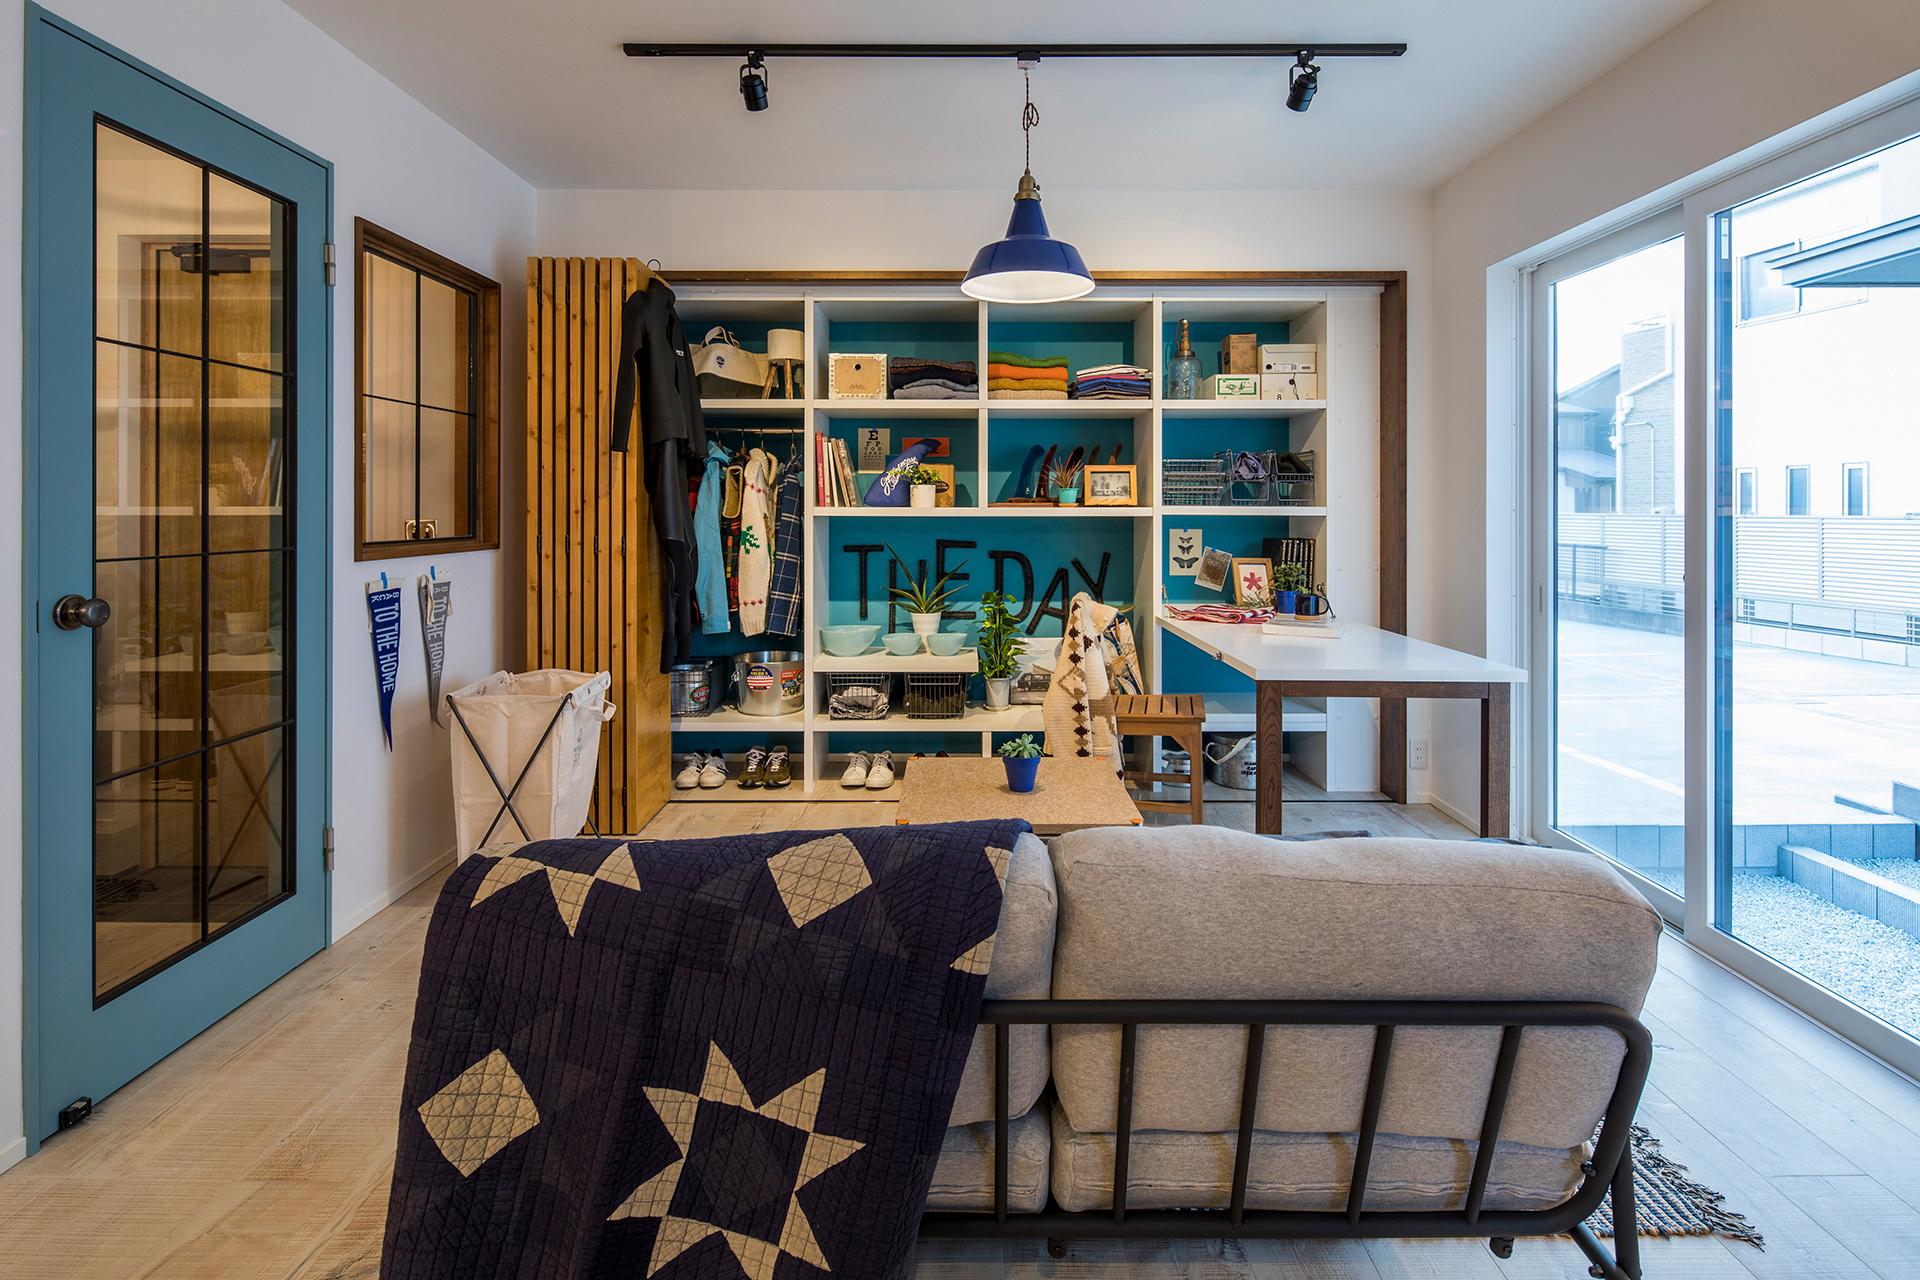 「casa rozzo(Grande blu)」イメージ06 撮影:東涌宏和